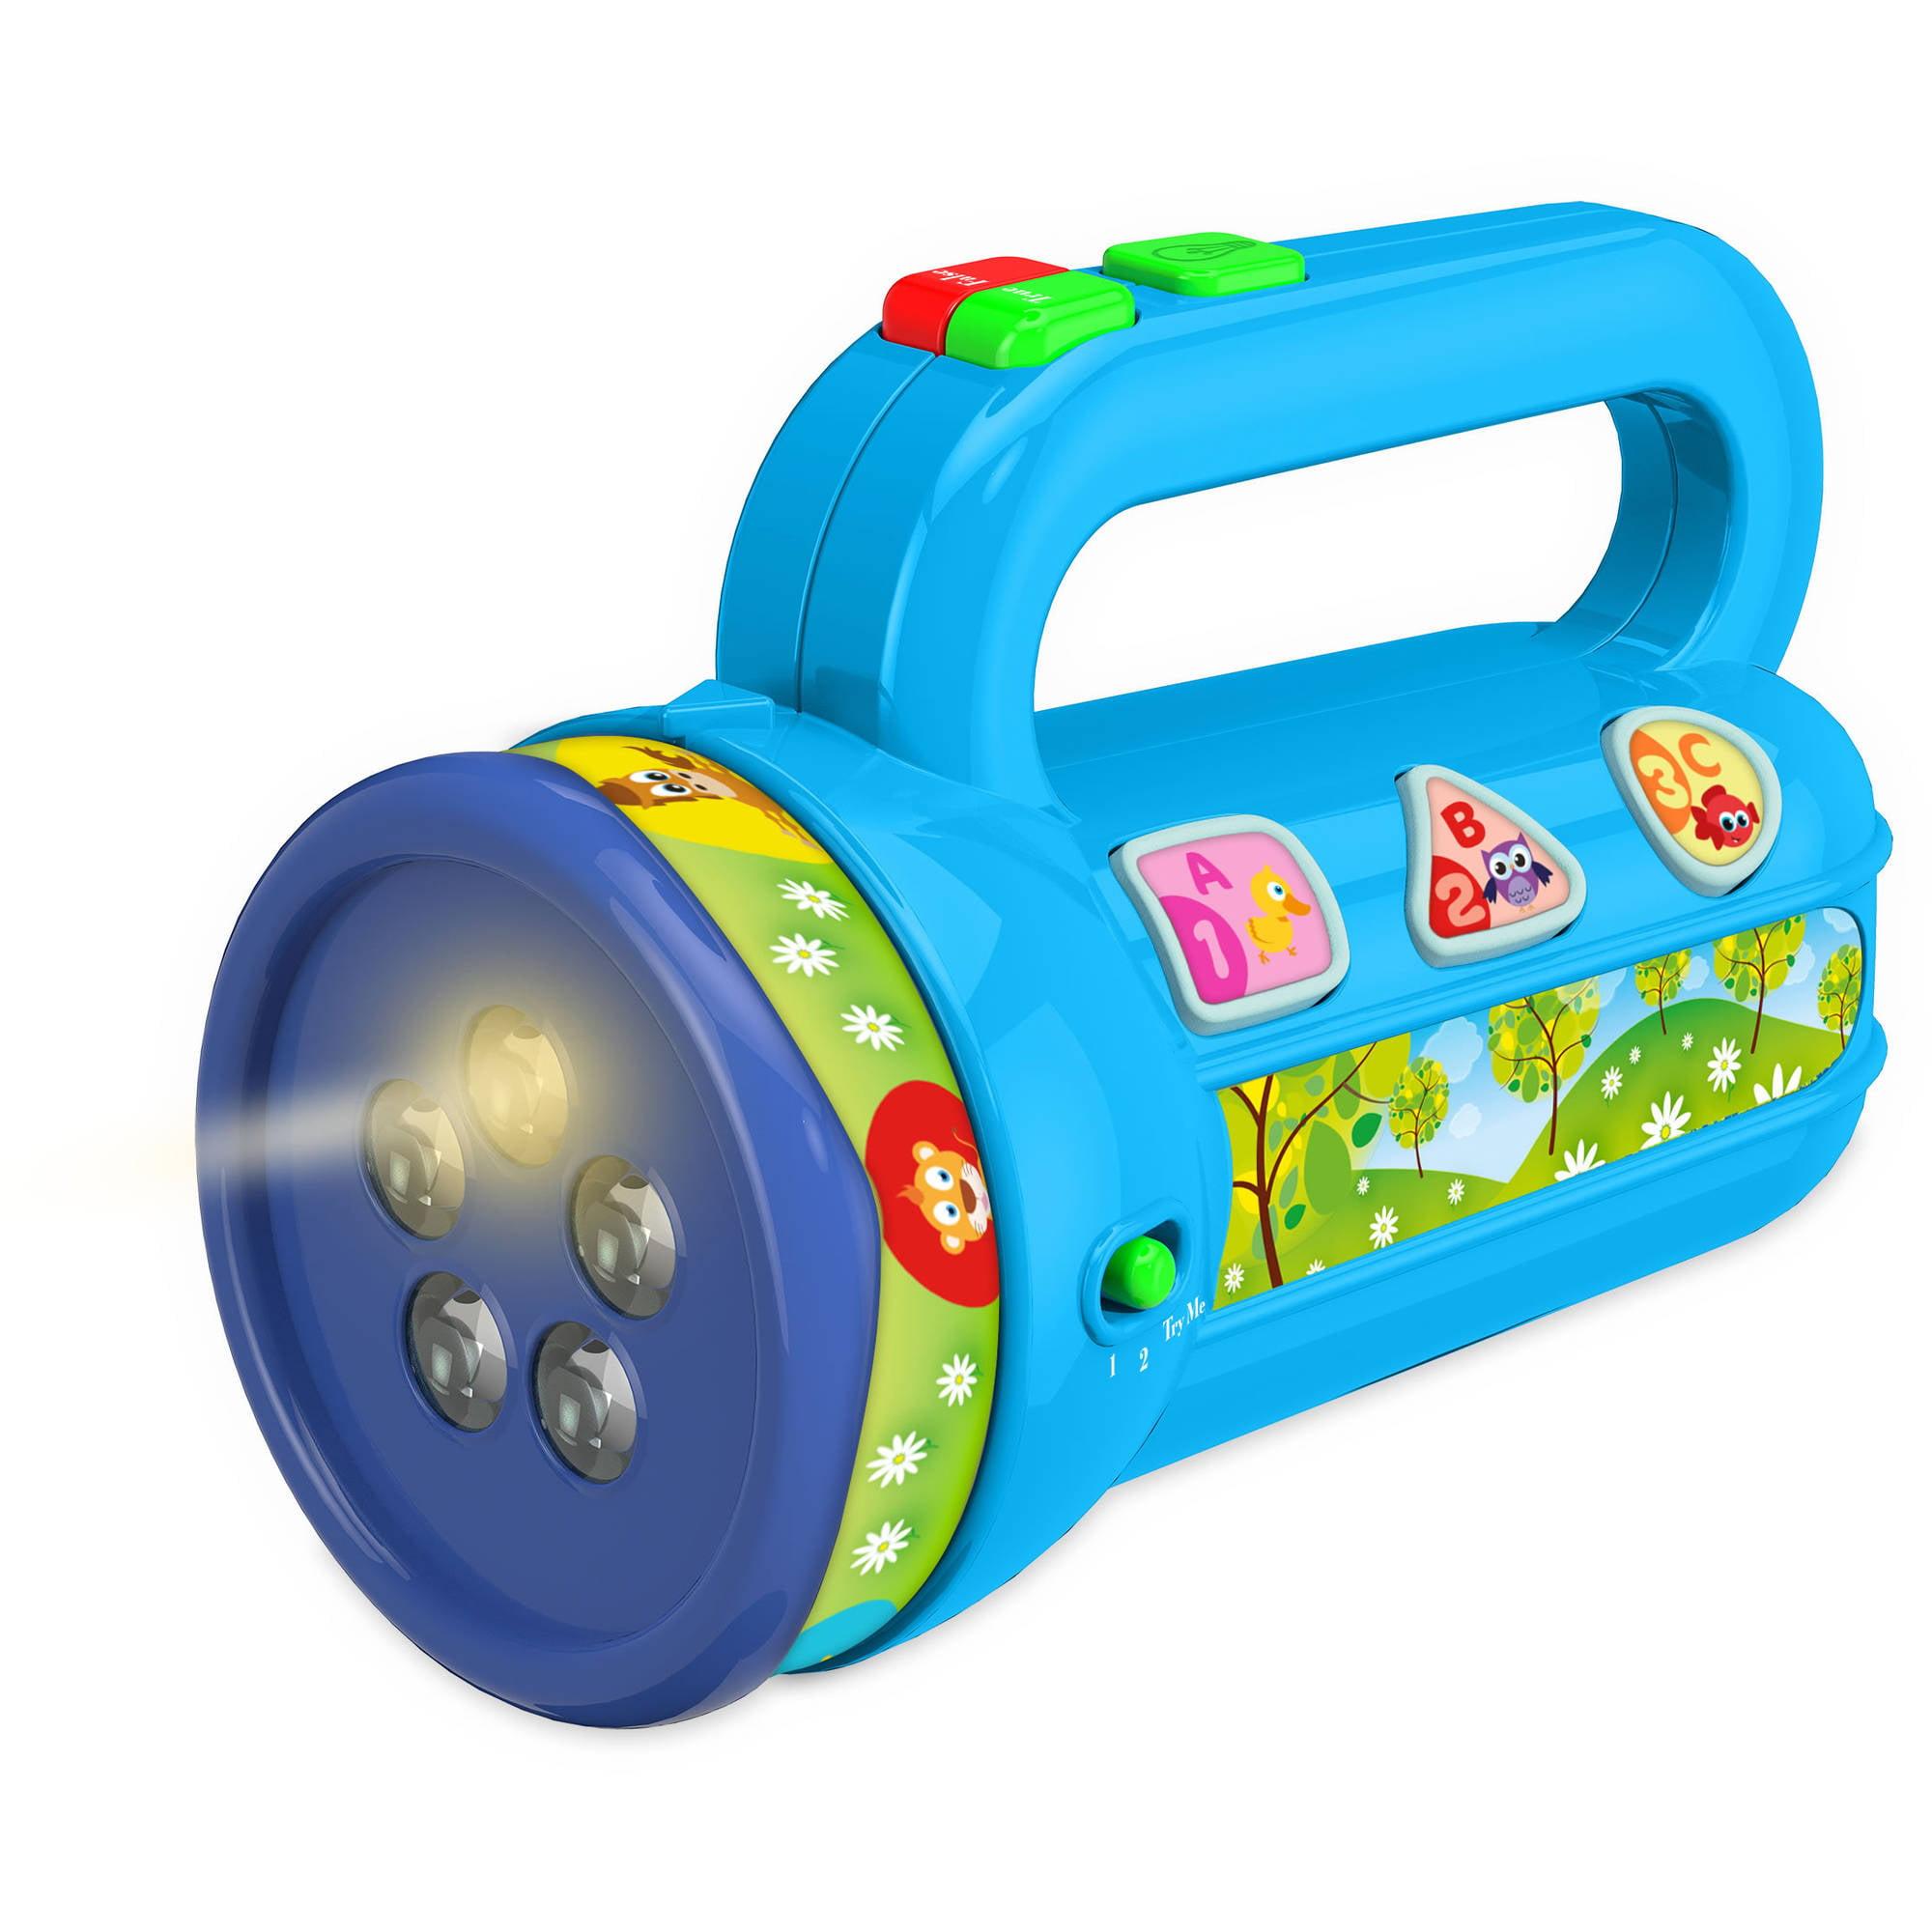 Kidz Delight Tech-Too My Fun N Learn Projector